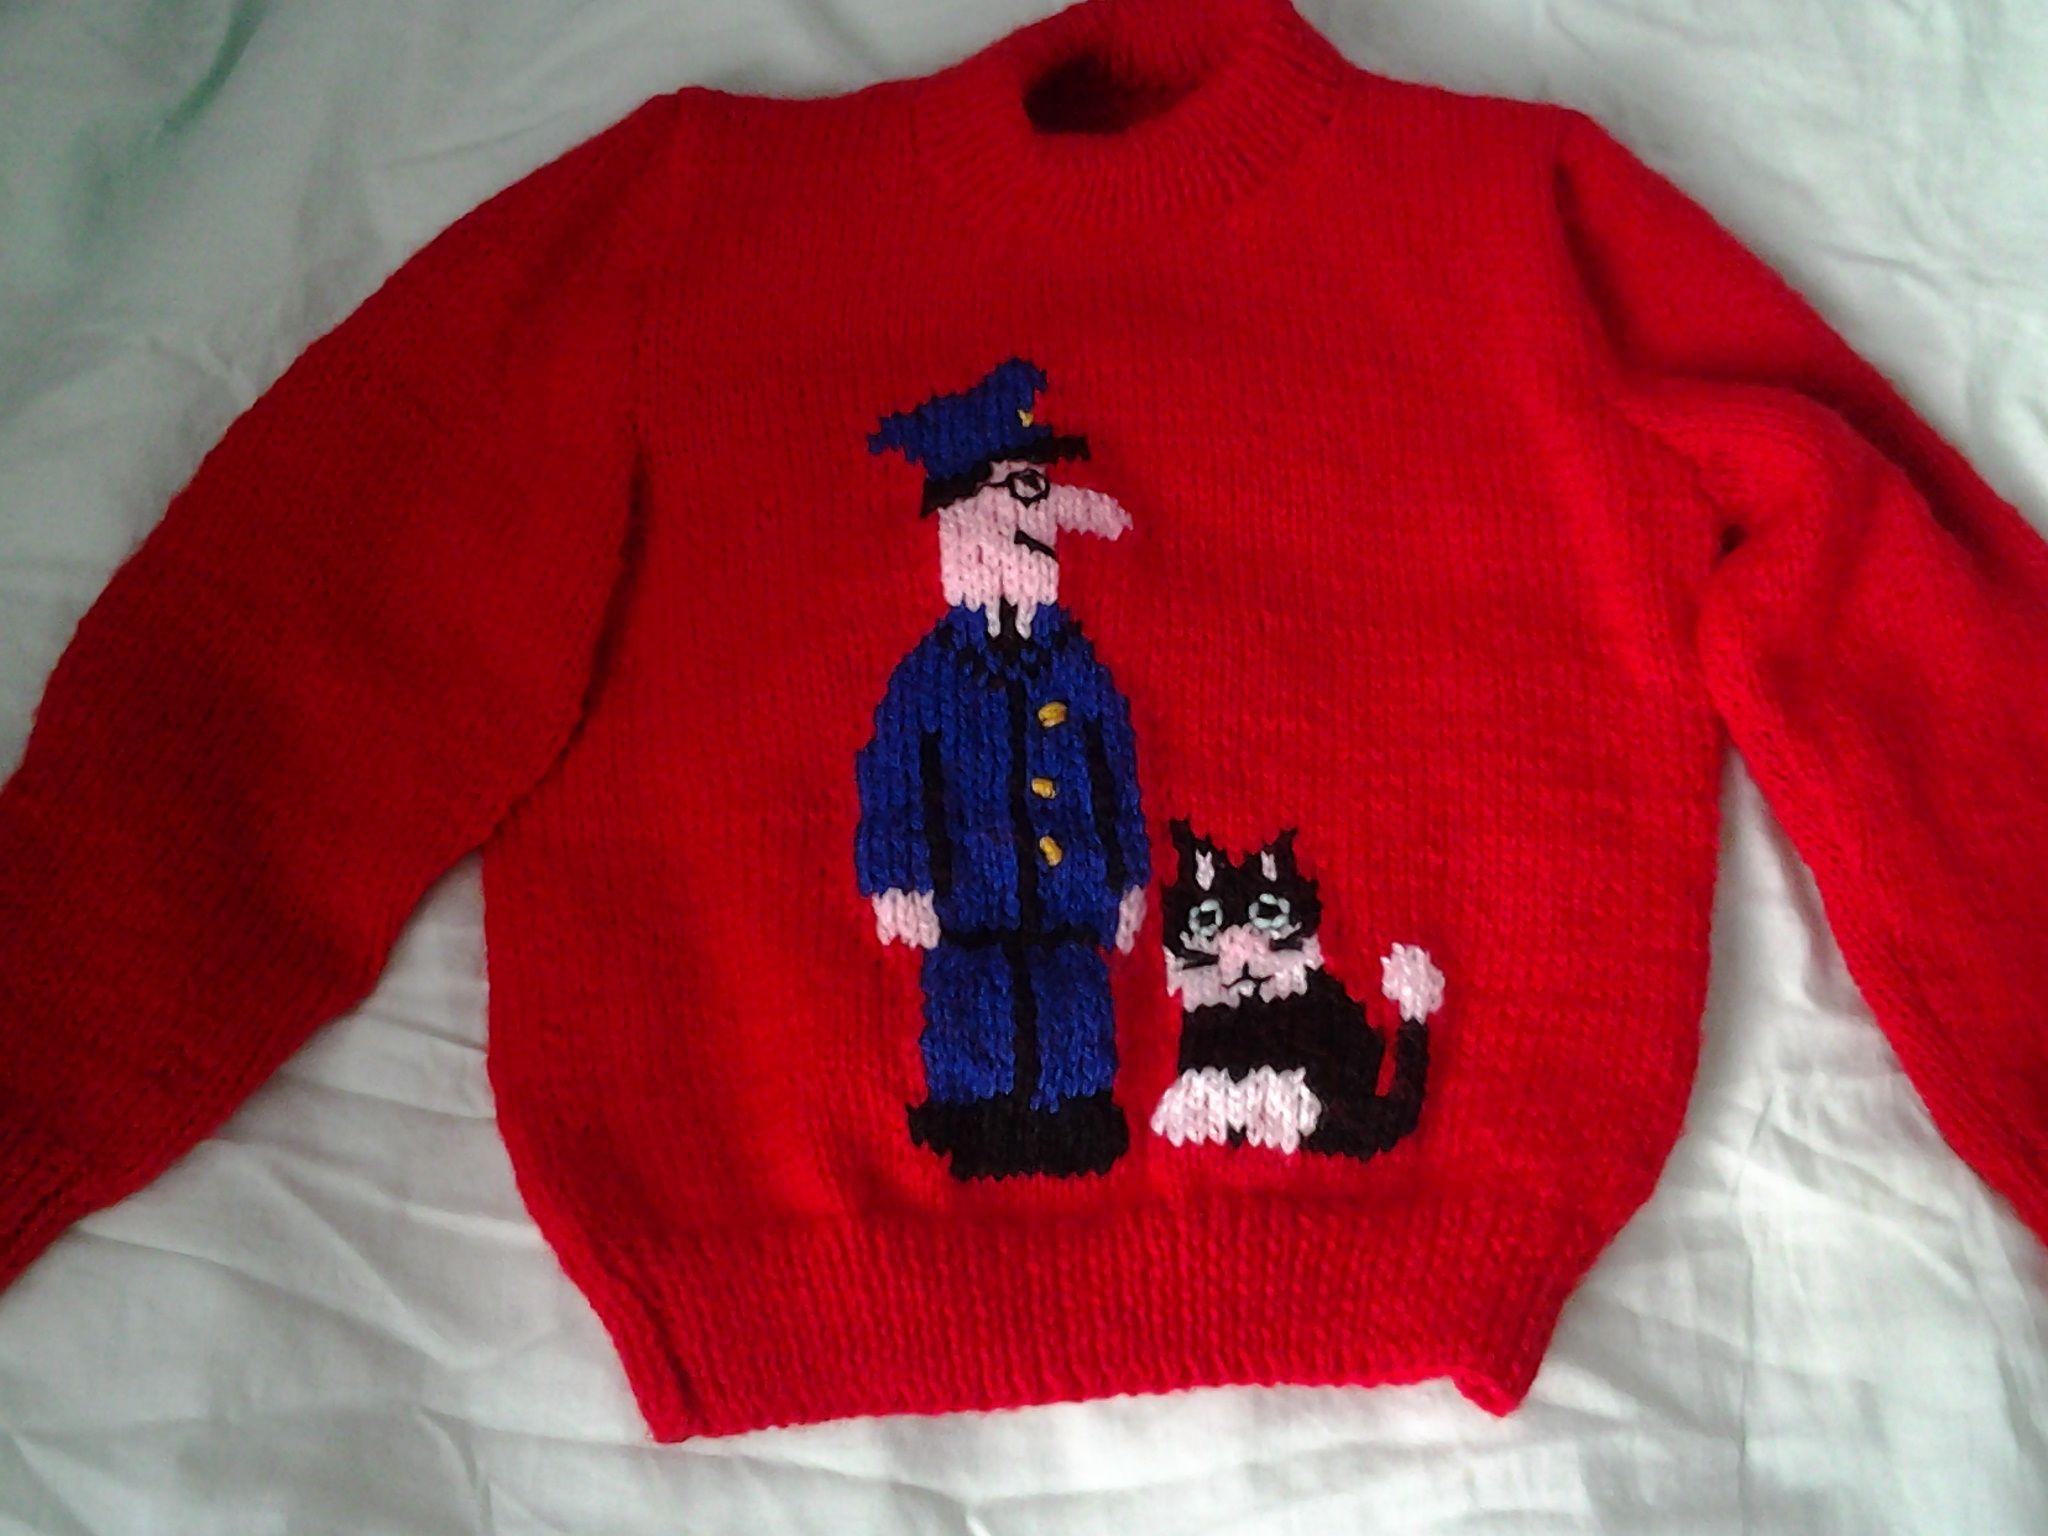 9 best knitting for when mum gets pinterest images on pinterest postman pat jumper bankloansurffo Images